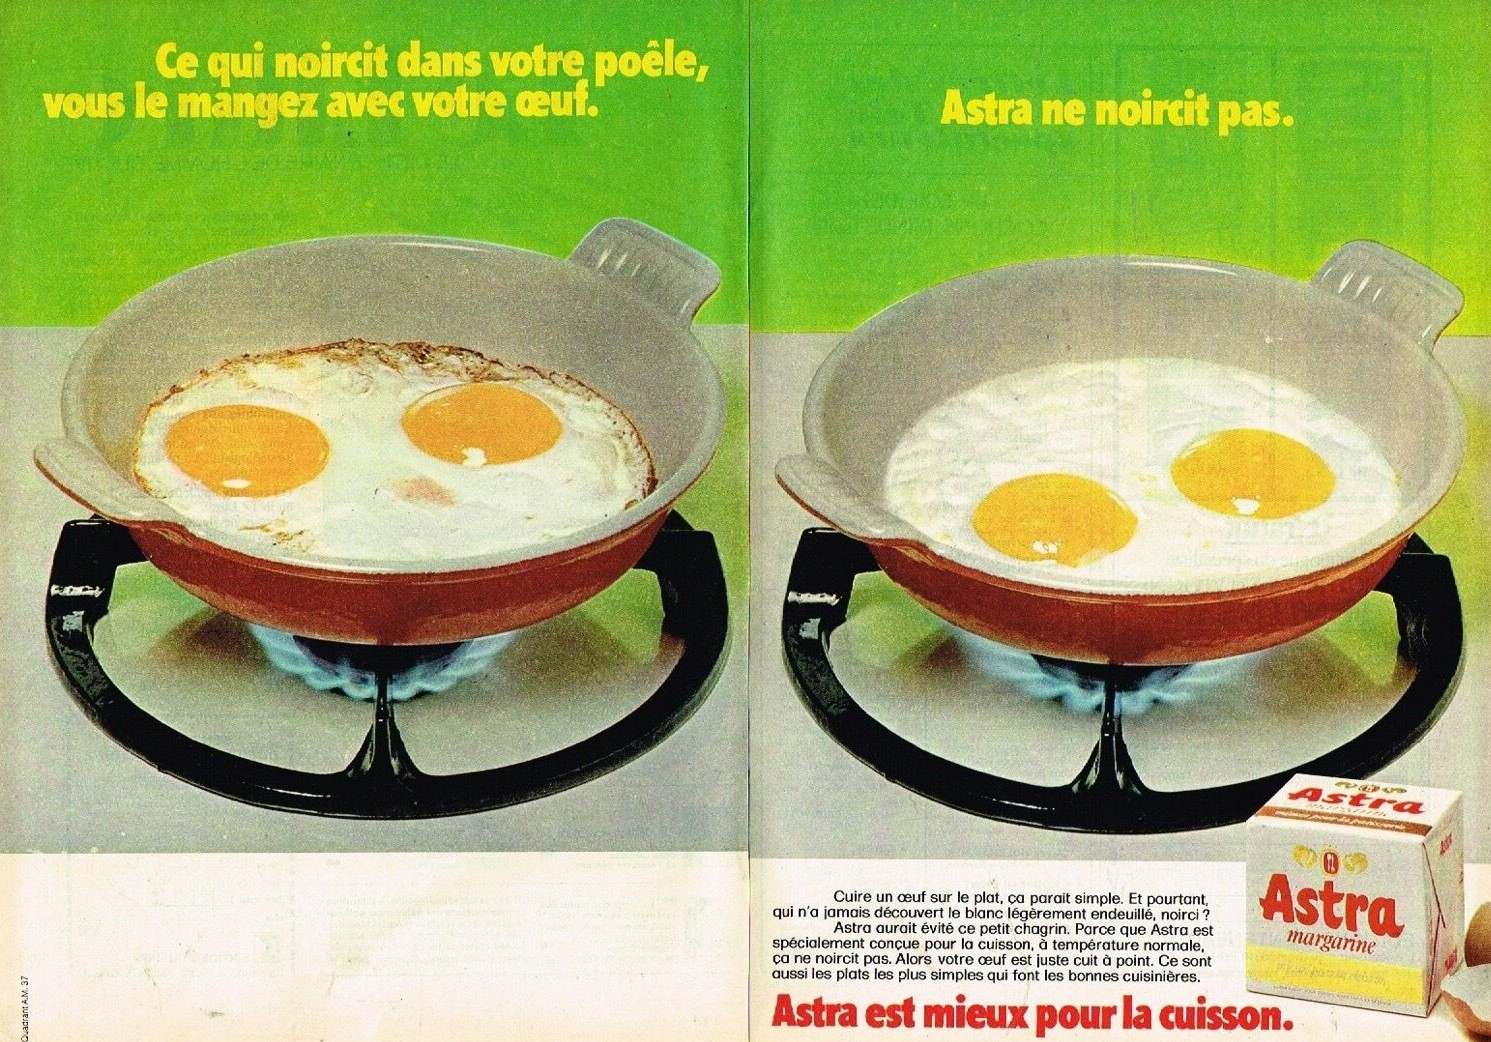 1974 La margarine Astra